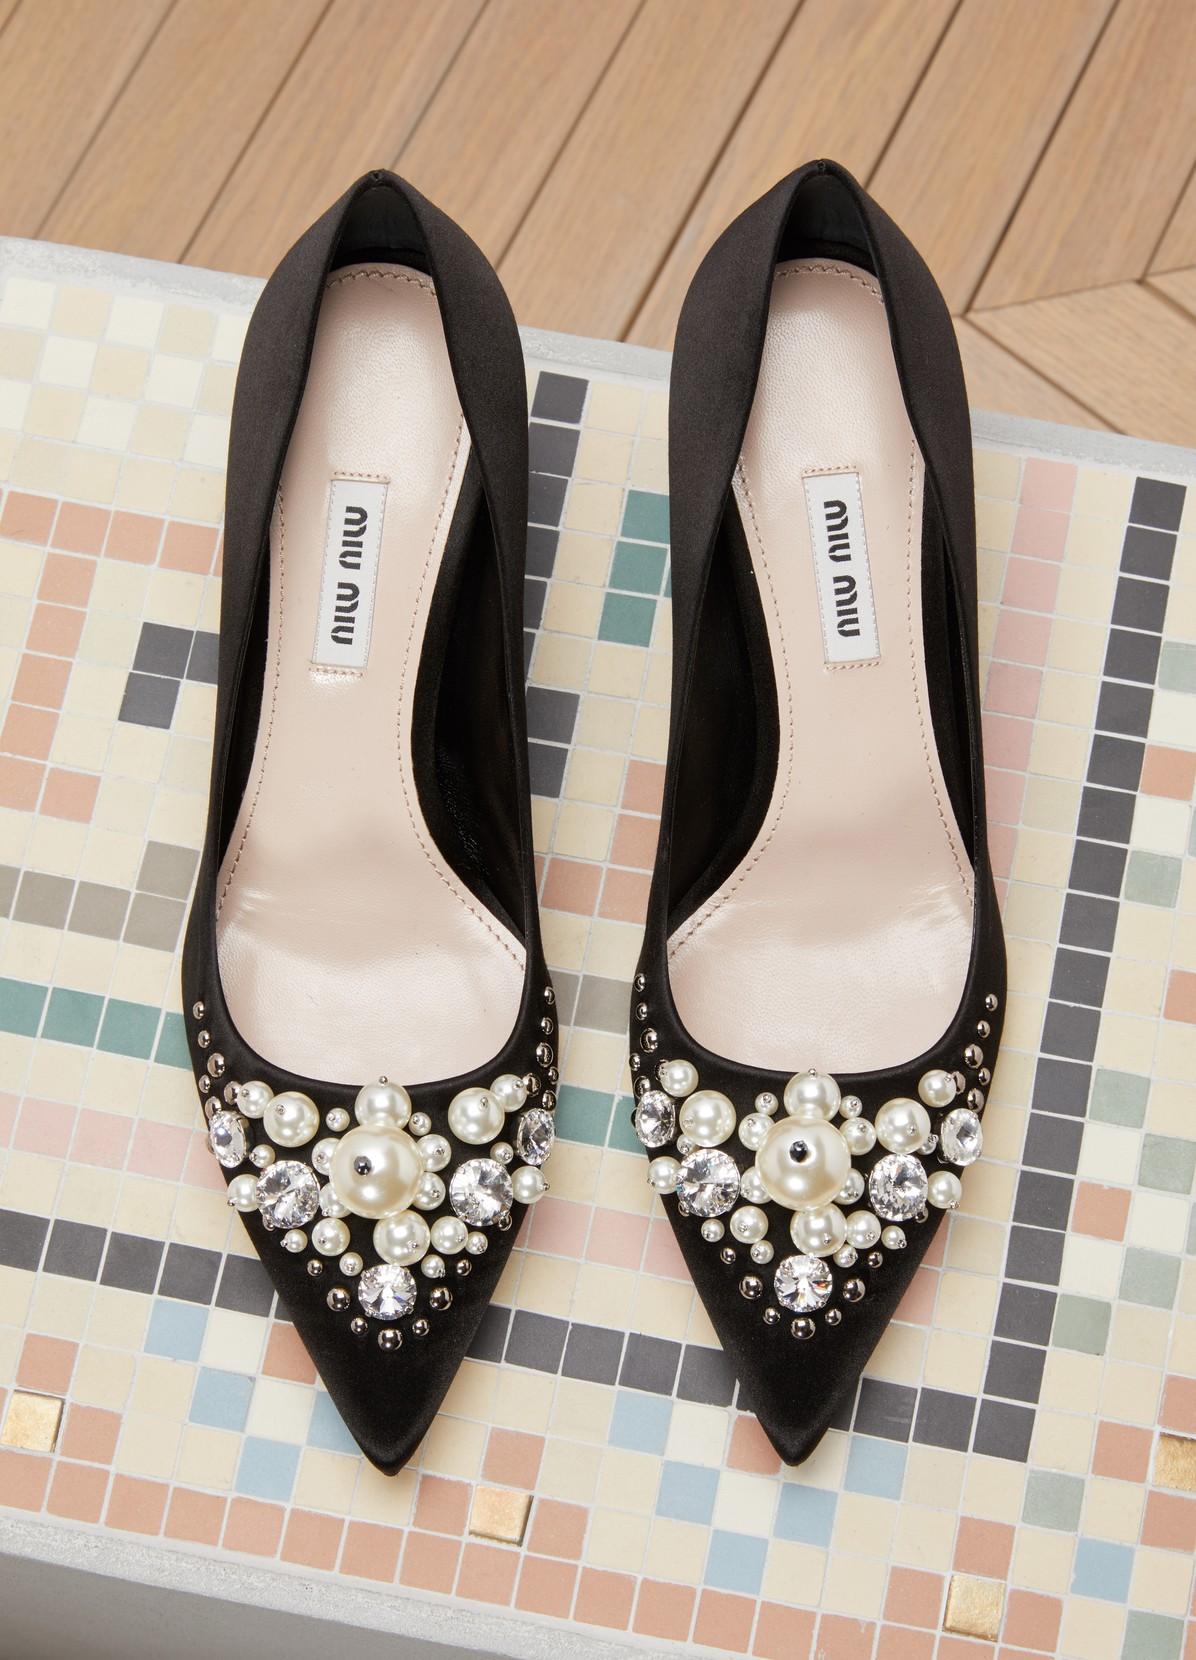 11ed0b28923c ... MIU MIU Mid heels pumps with pearls details ...